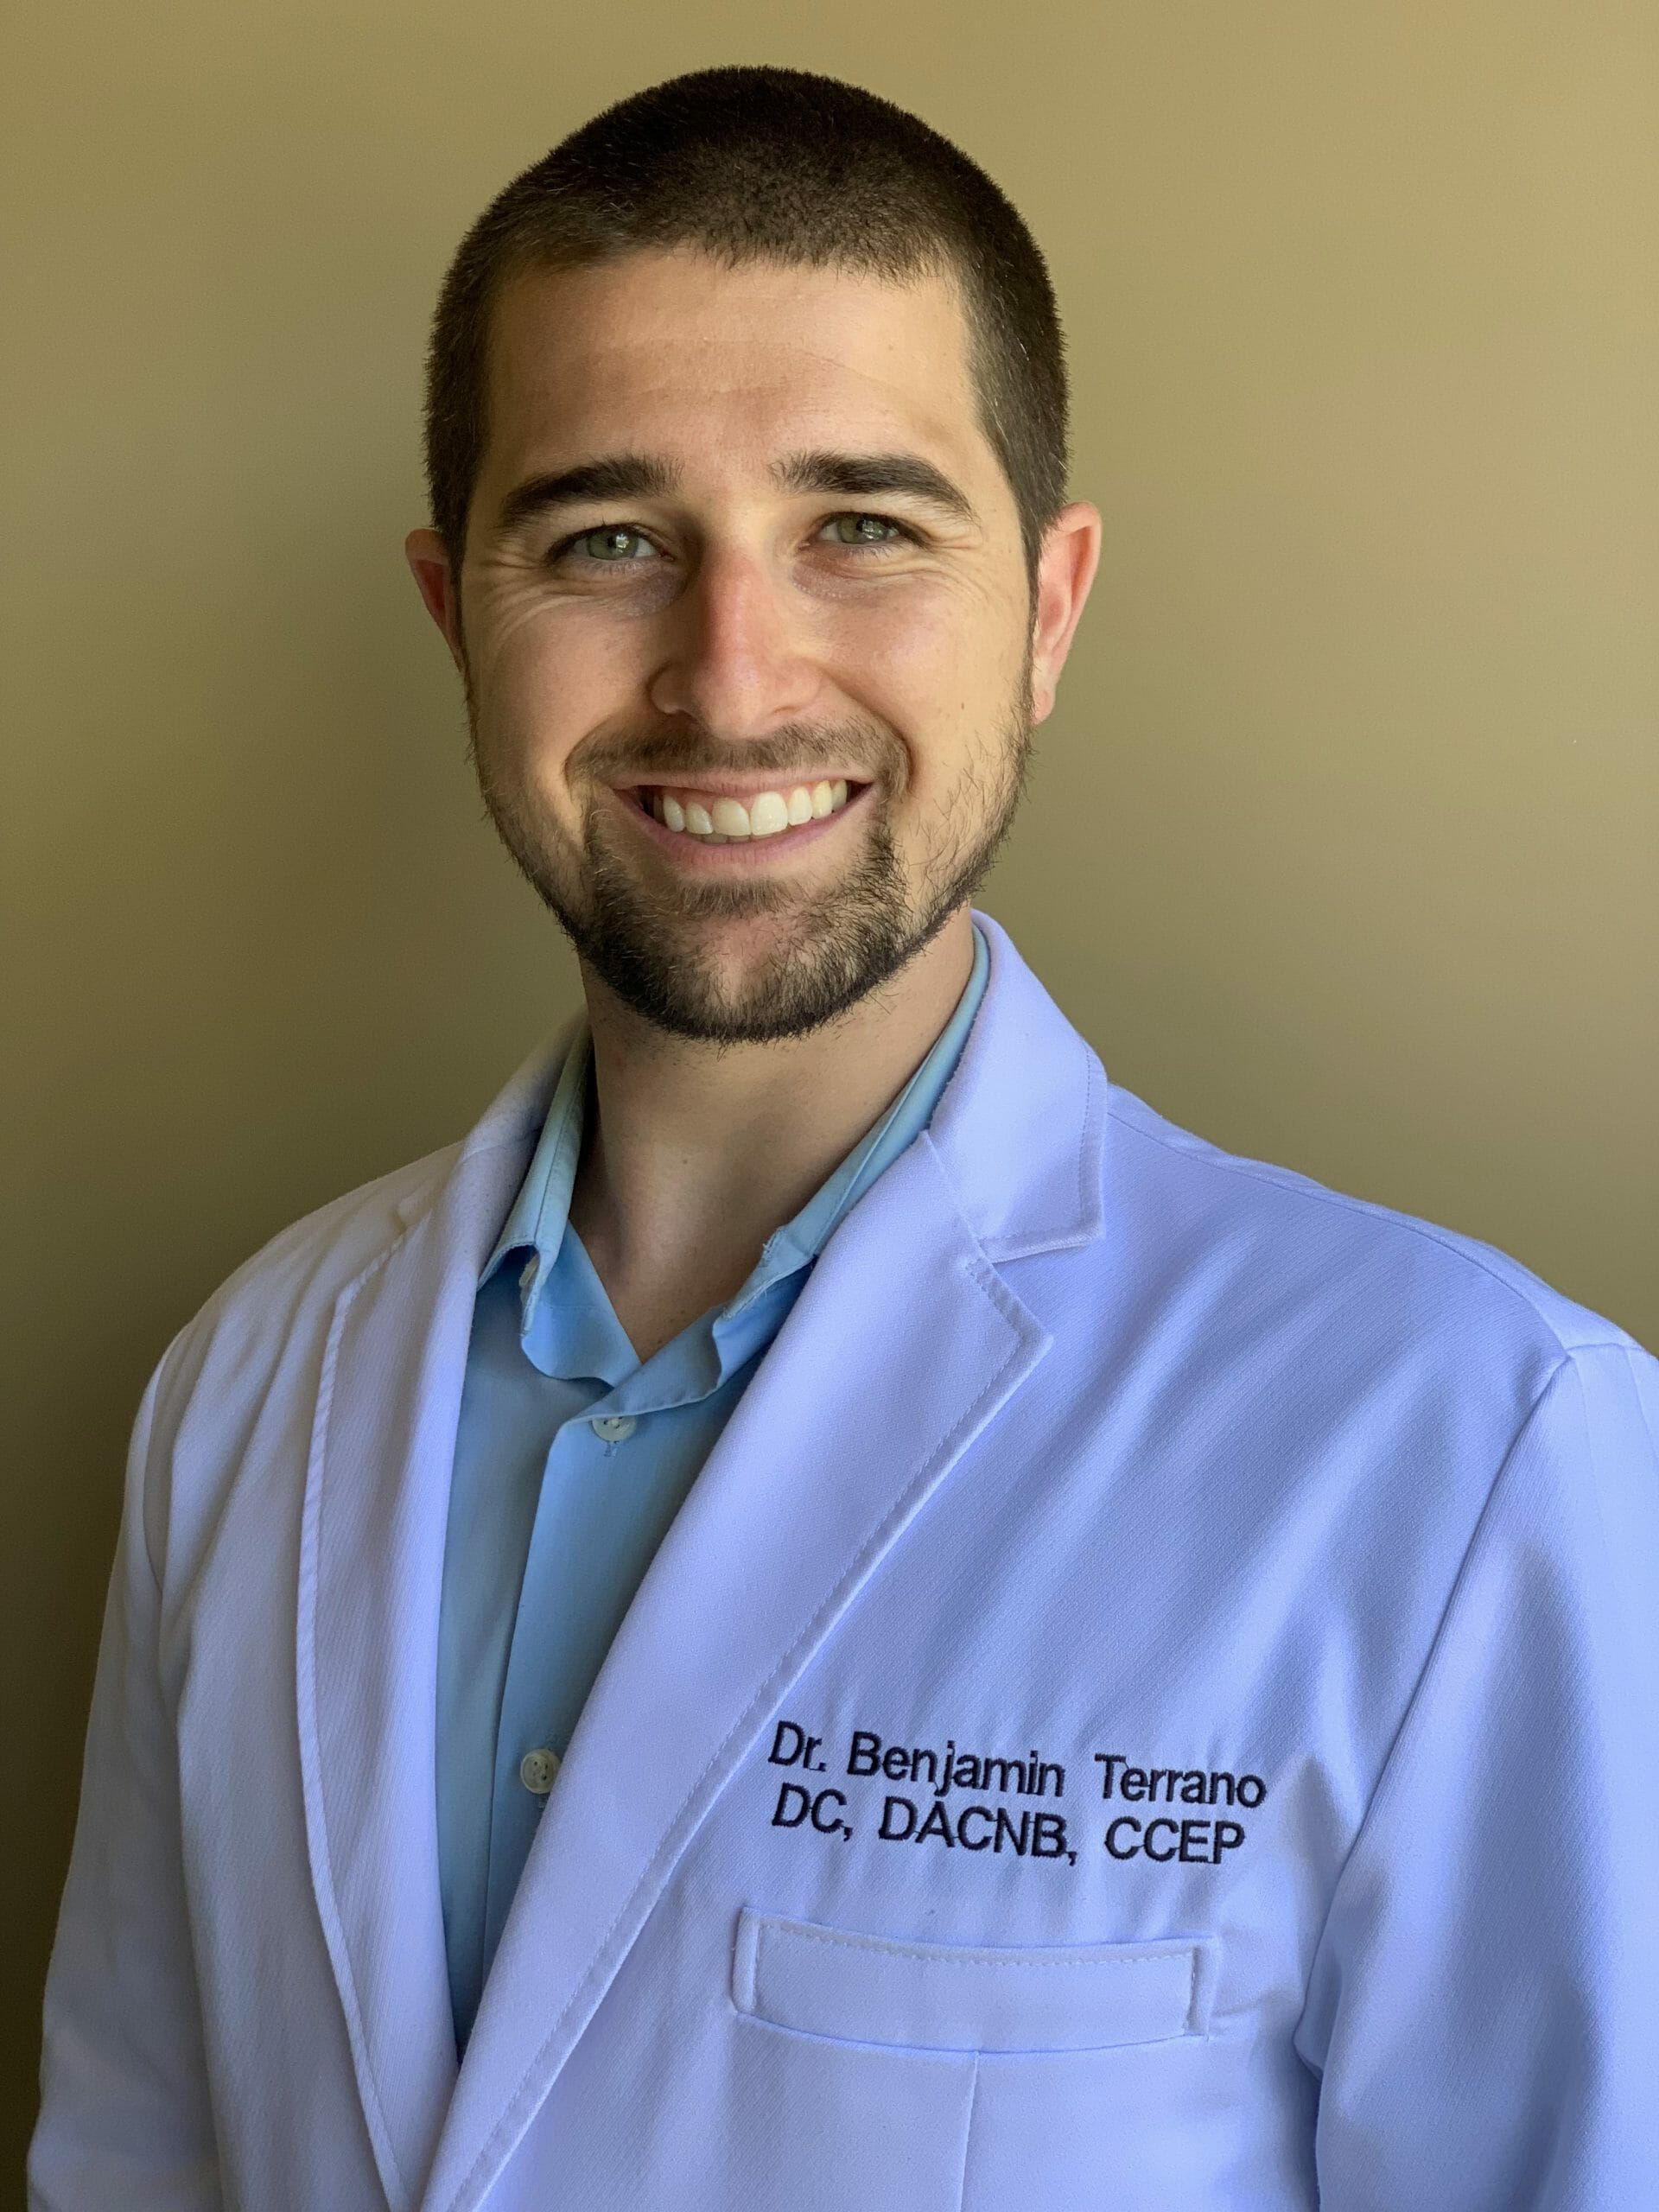 Dr. Benjamin Terrano DC, DACNB, CCEP